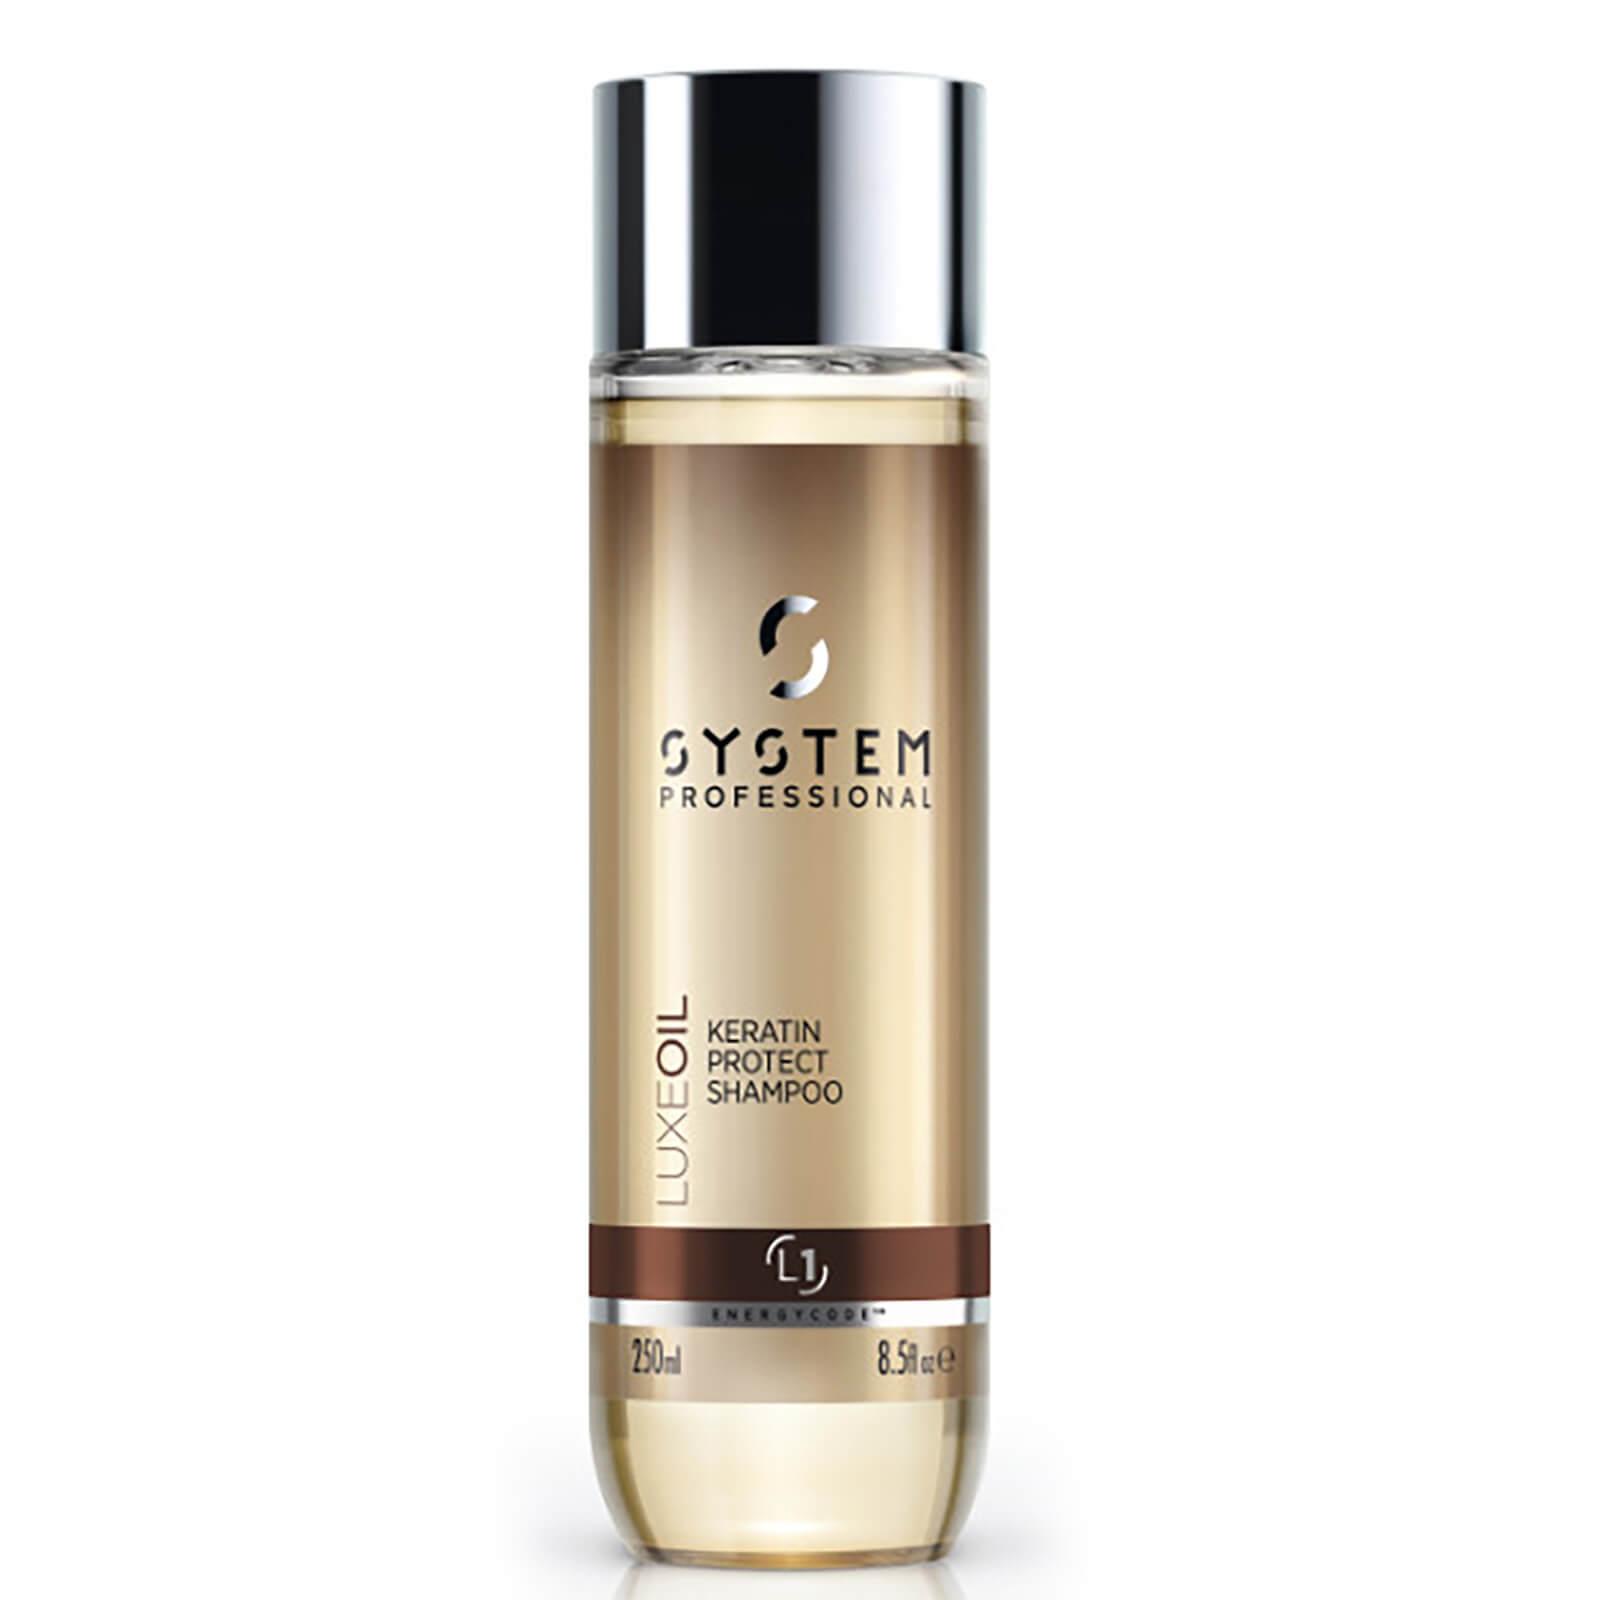 System Professional Shampooing Protecteur à la Kératine Luxe Oil System Professional 250 ml